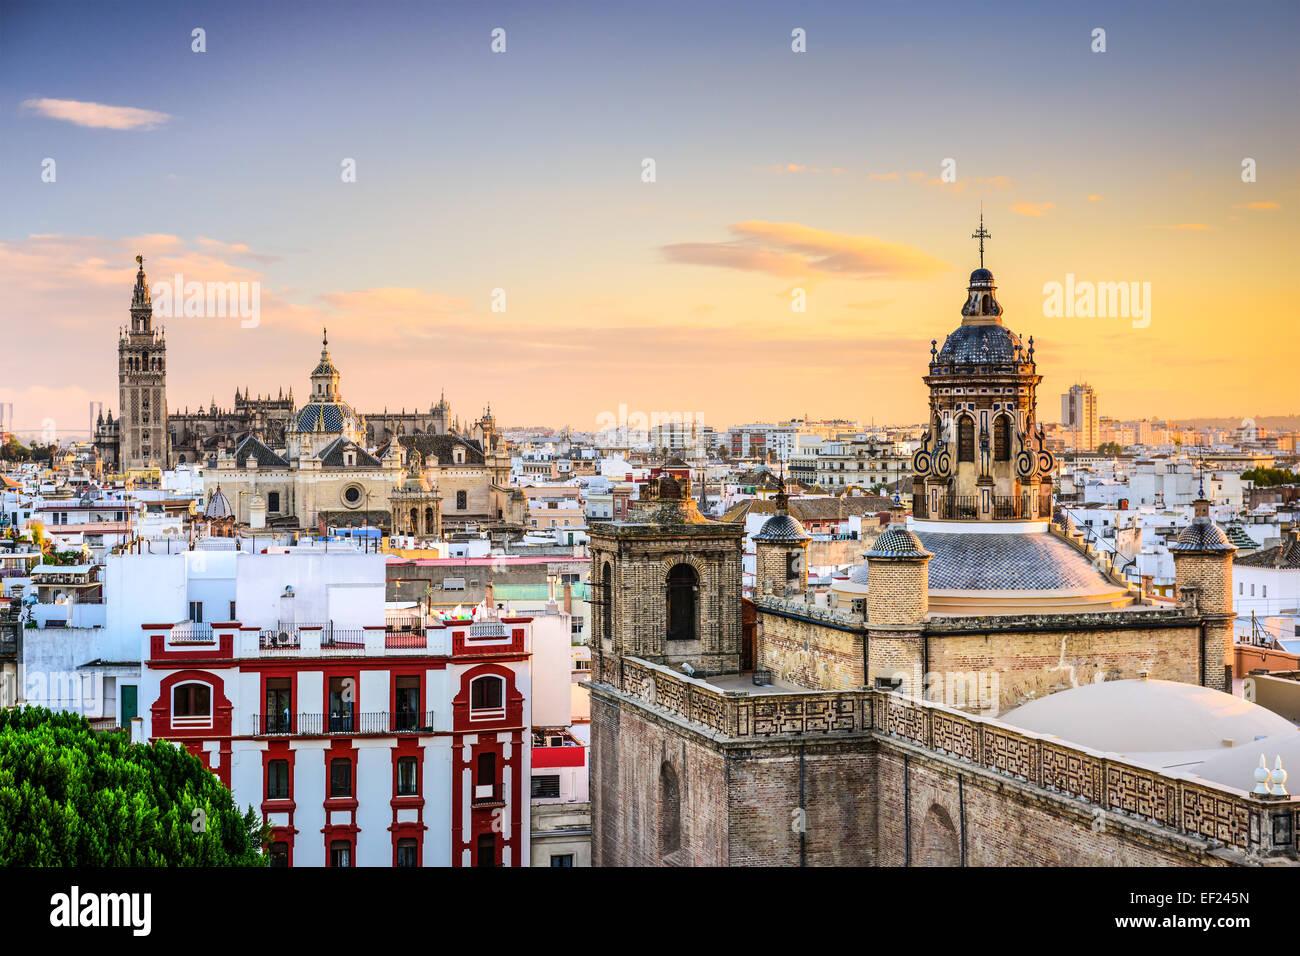 Séville, Espagne city skyline at Dusk. Photo Stock